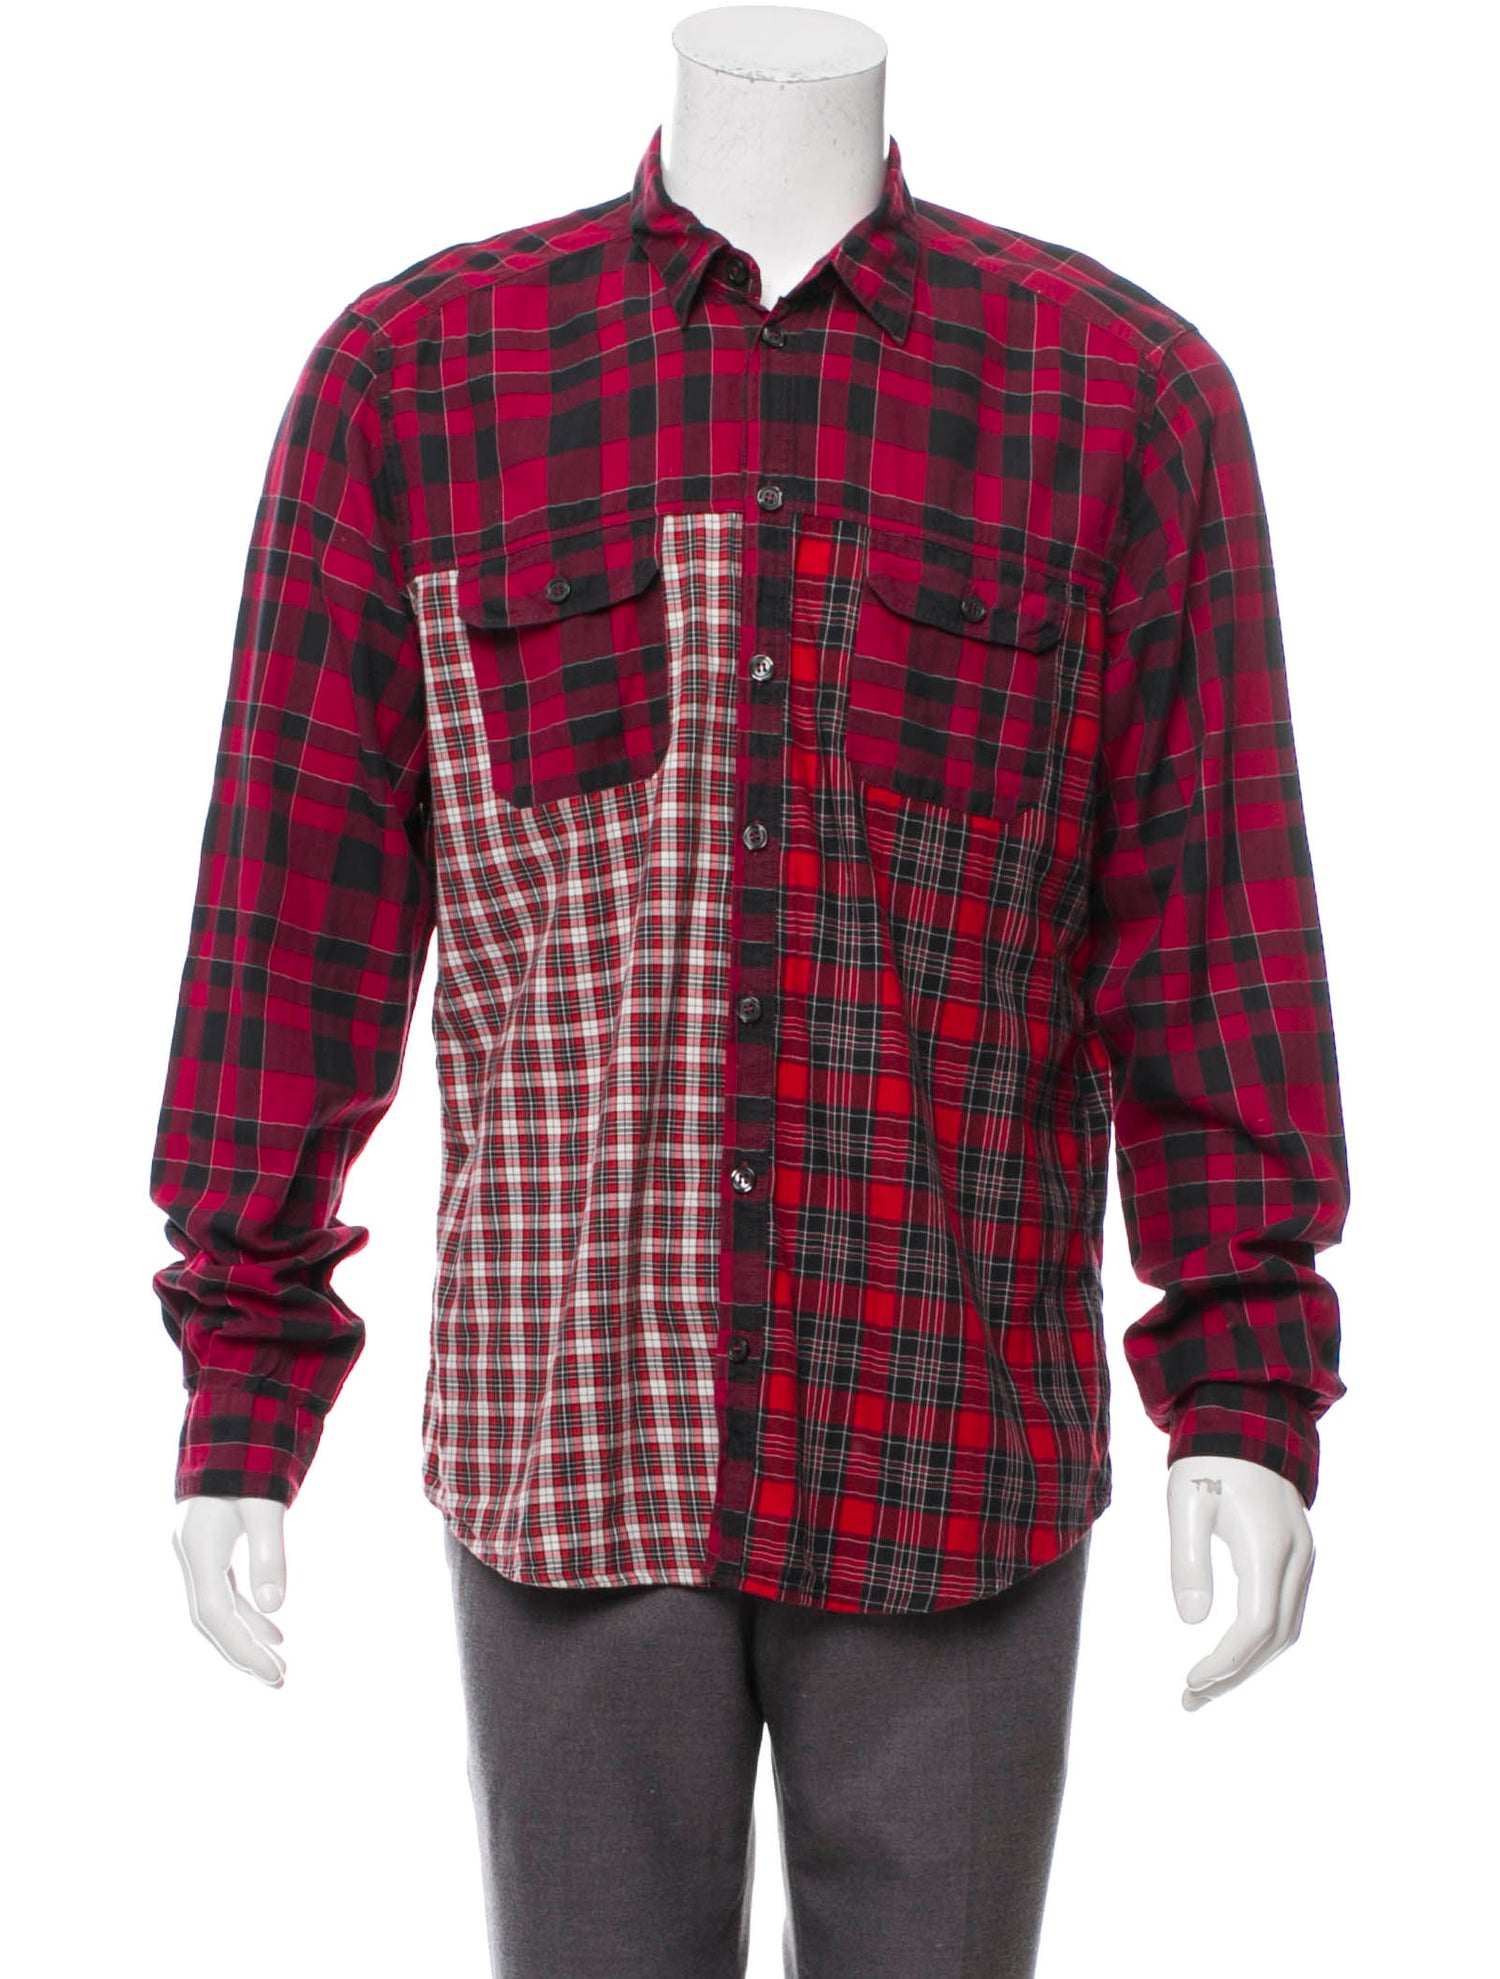 Sicilia Plaid Shirt - Dolce & Gabbana, $140